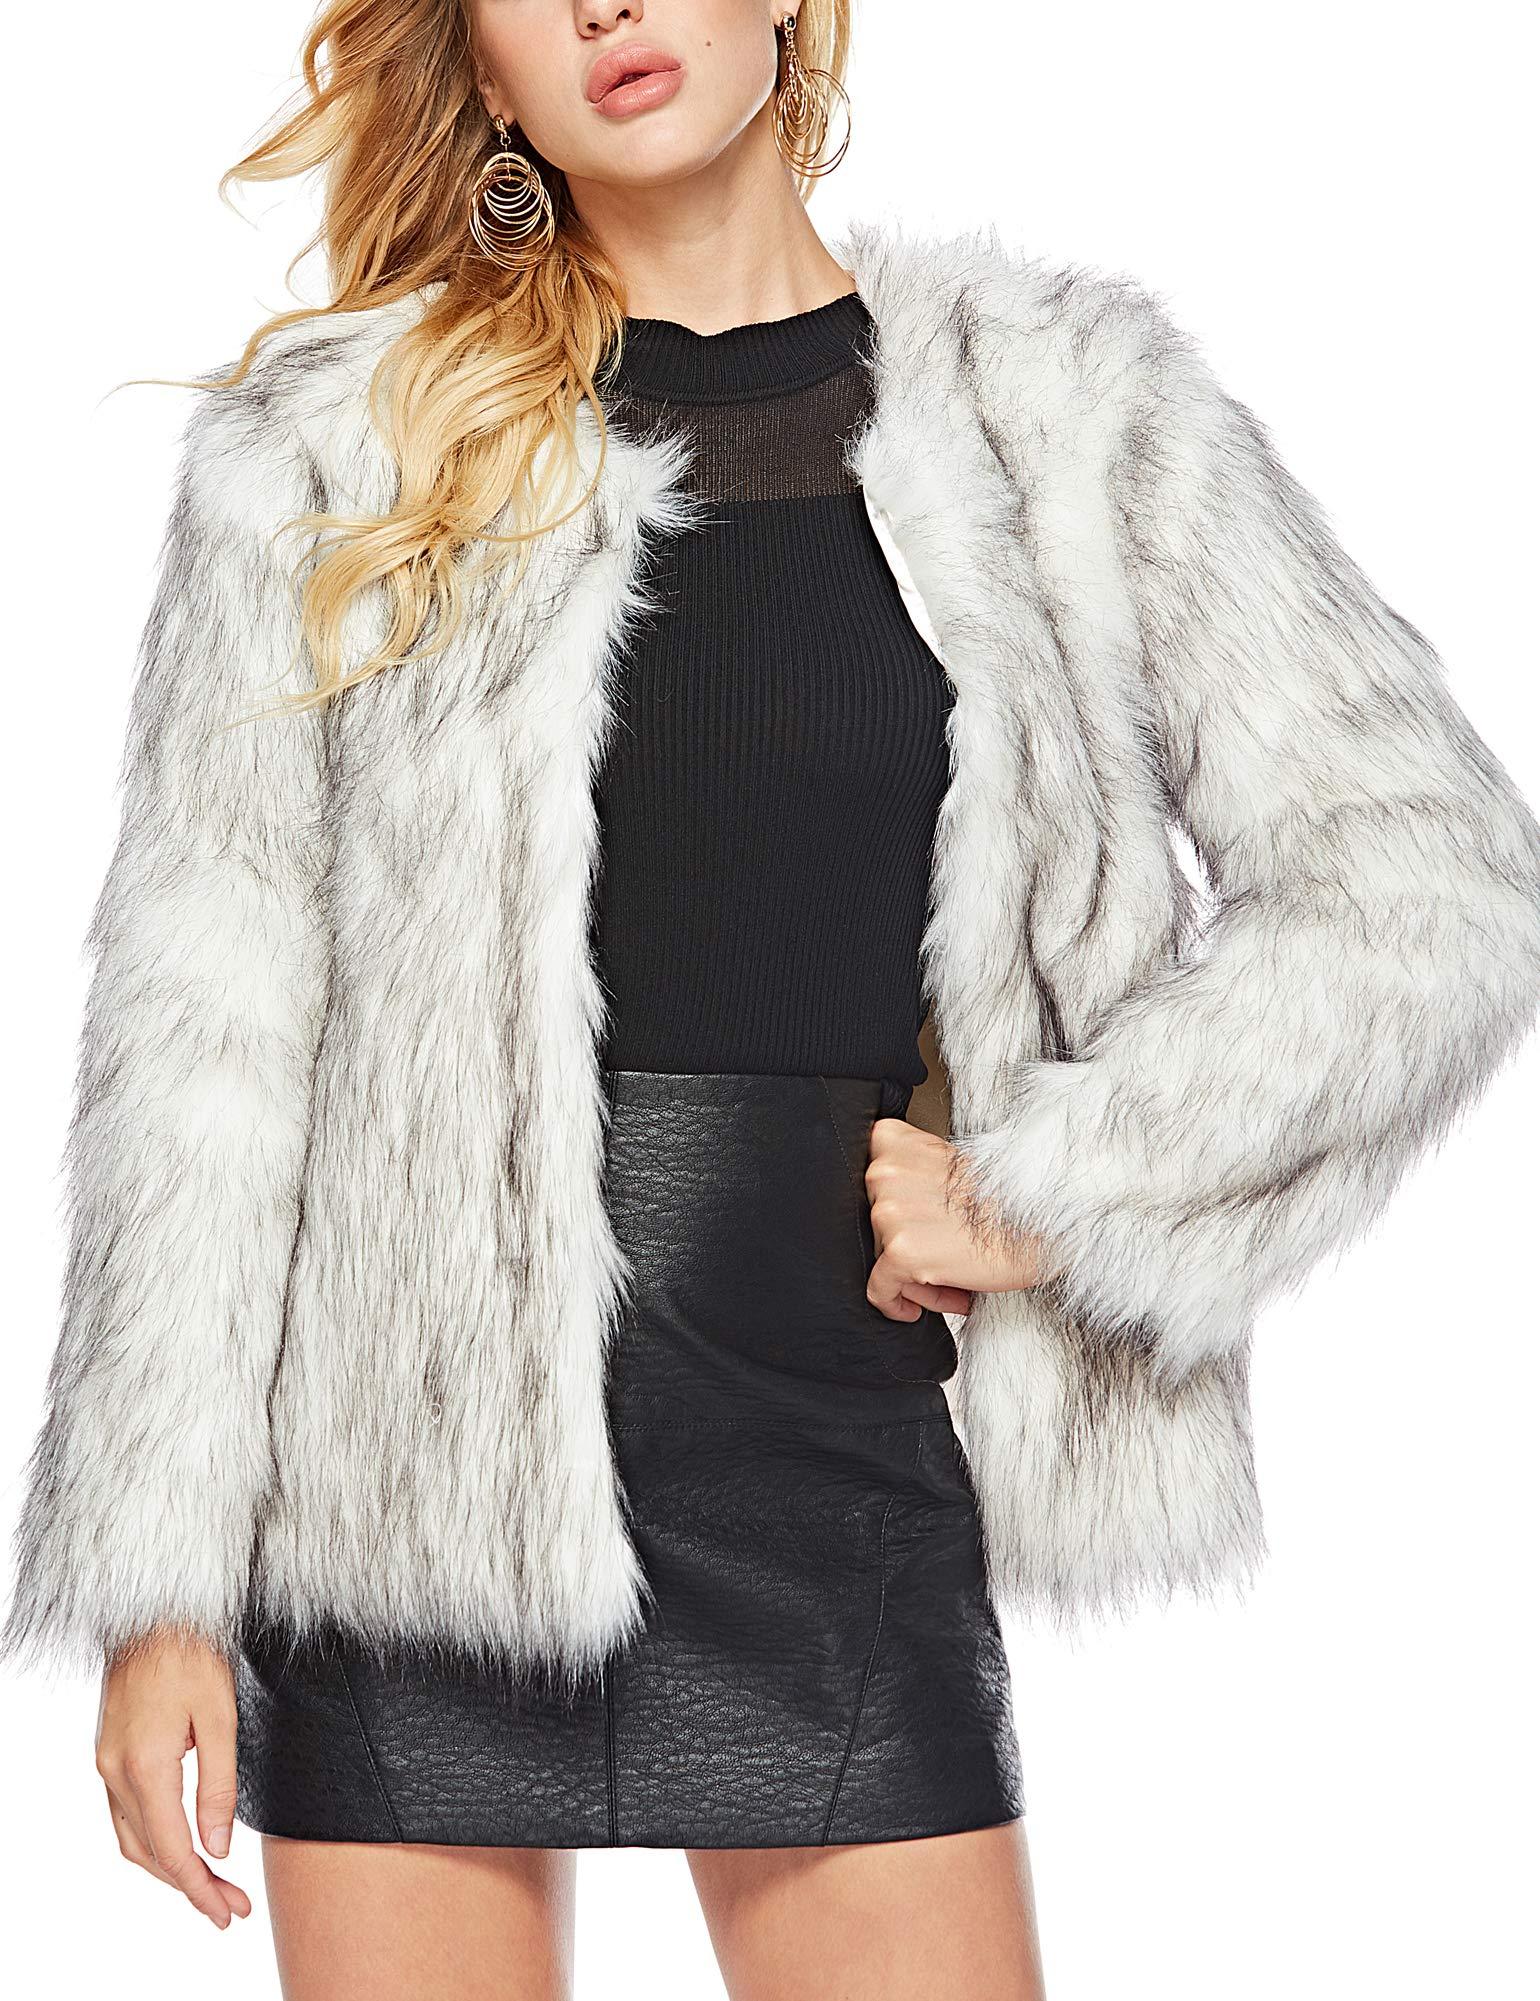 Caracilia Women's Vintage Winter Outwear Warm Shaggy Faux Fur Coat Jacket Luxury heibaijian S CAFB2